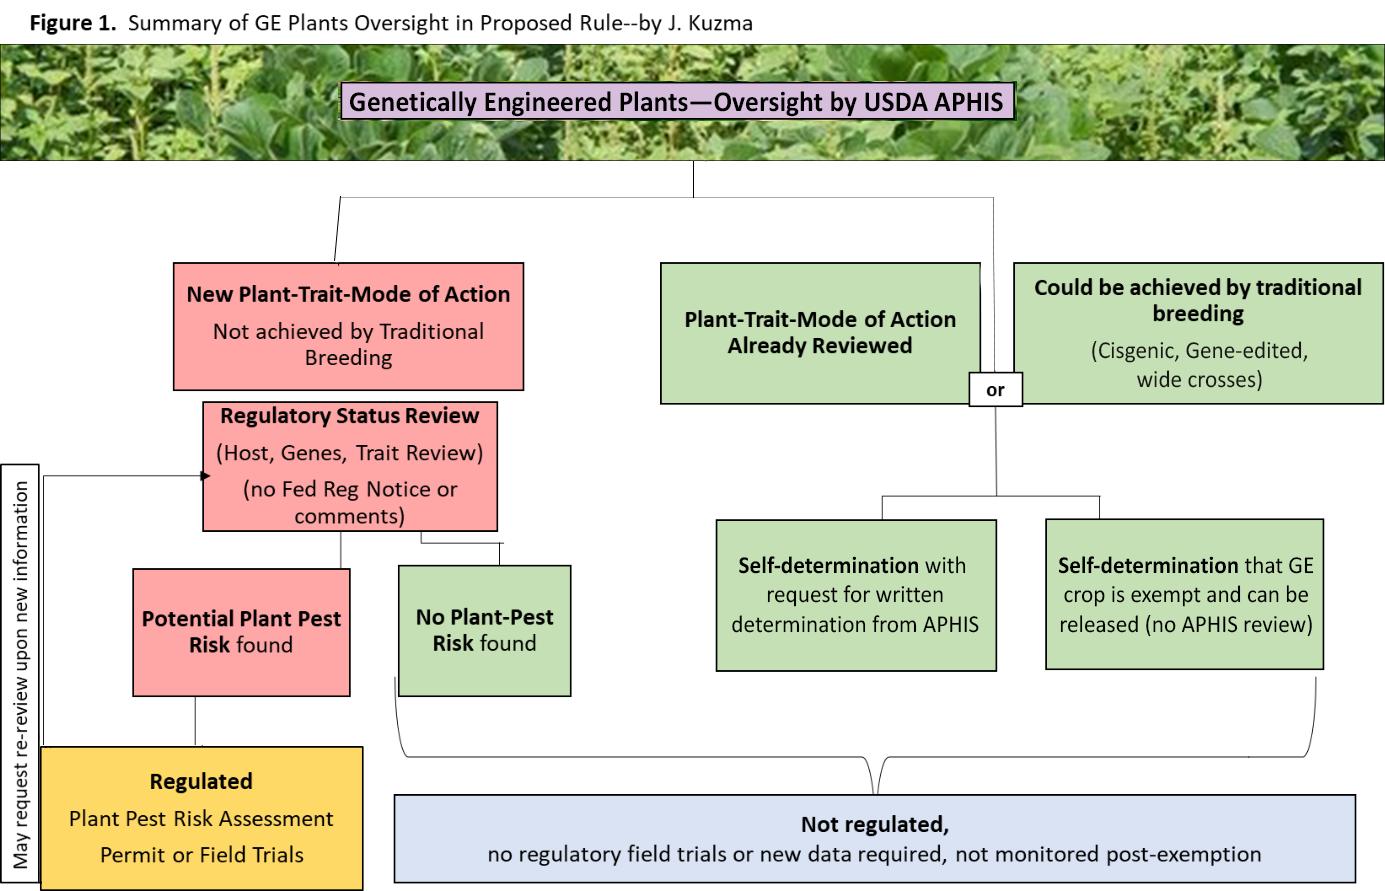 Figure 1 Summary of GE Plants Oversight in Proposed Rule - J. Kuzma